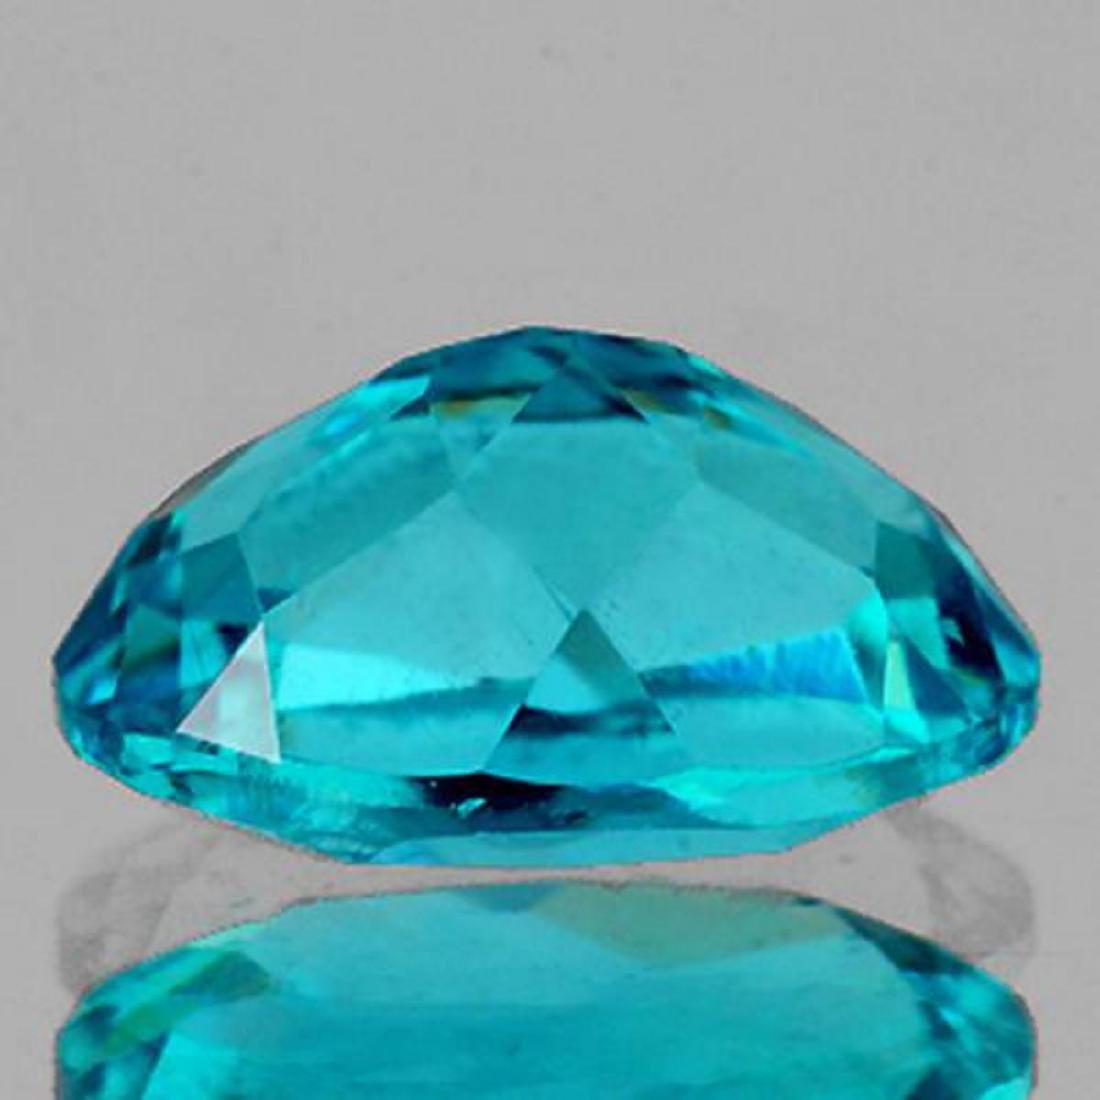 Natural Apatite Paraiba Blue Pair 7 x 5 mm - VVS - 2